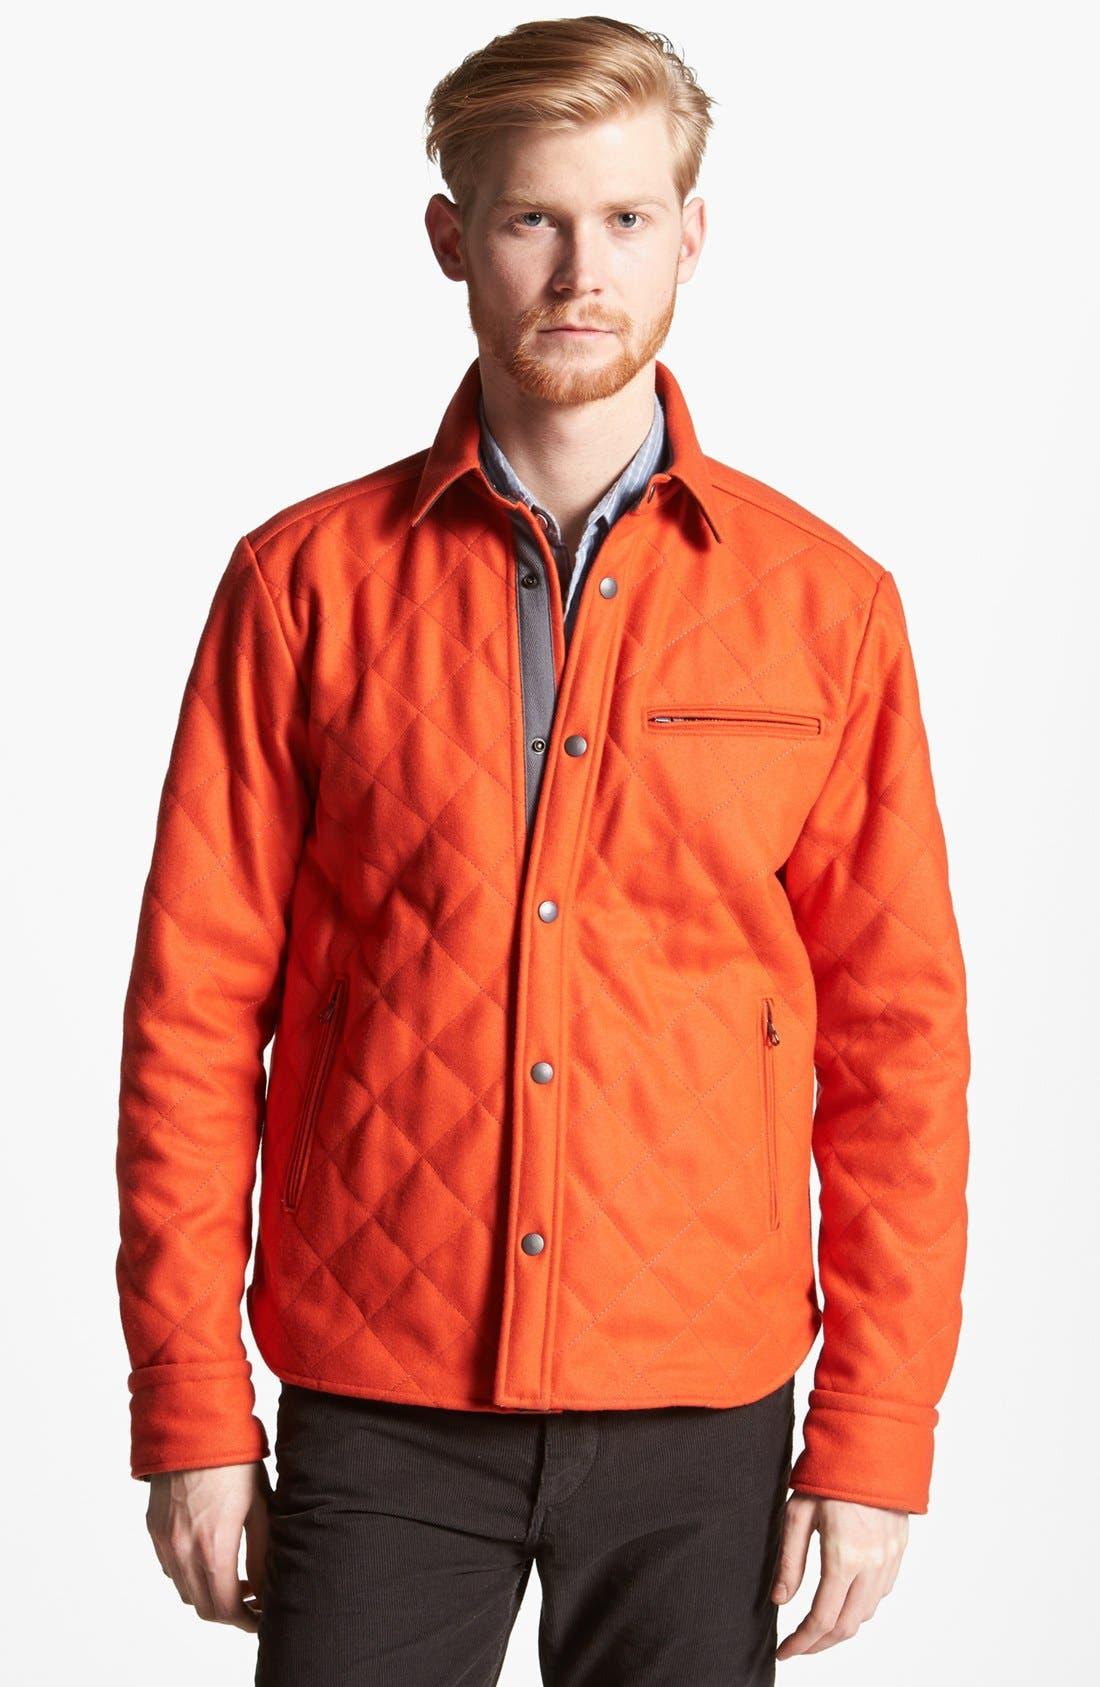 Alternate Image 1 Selected - rag & bone 'Holme' Quilted Jacket